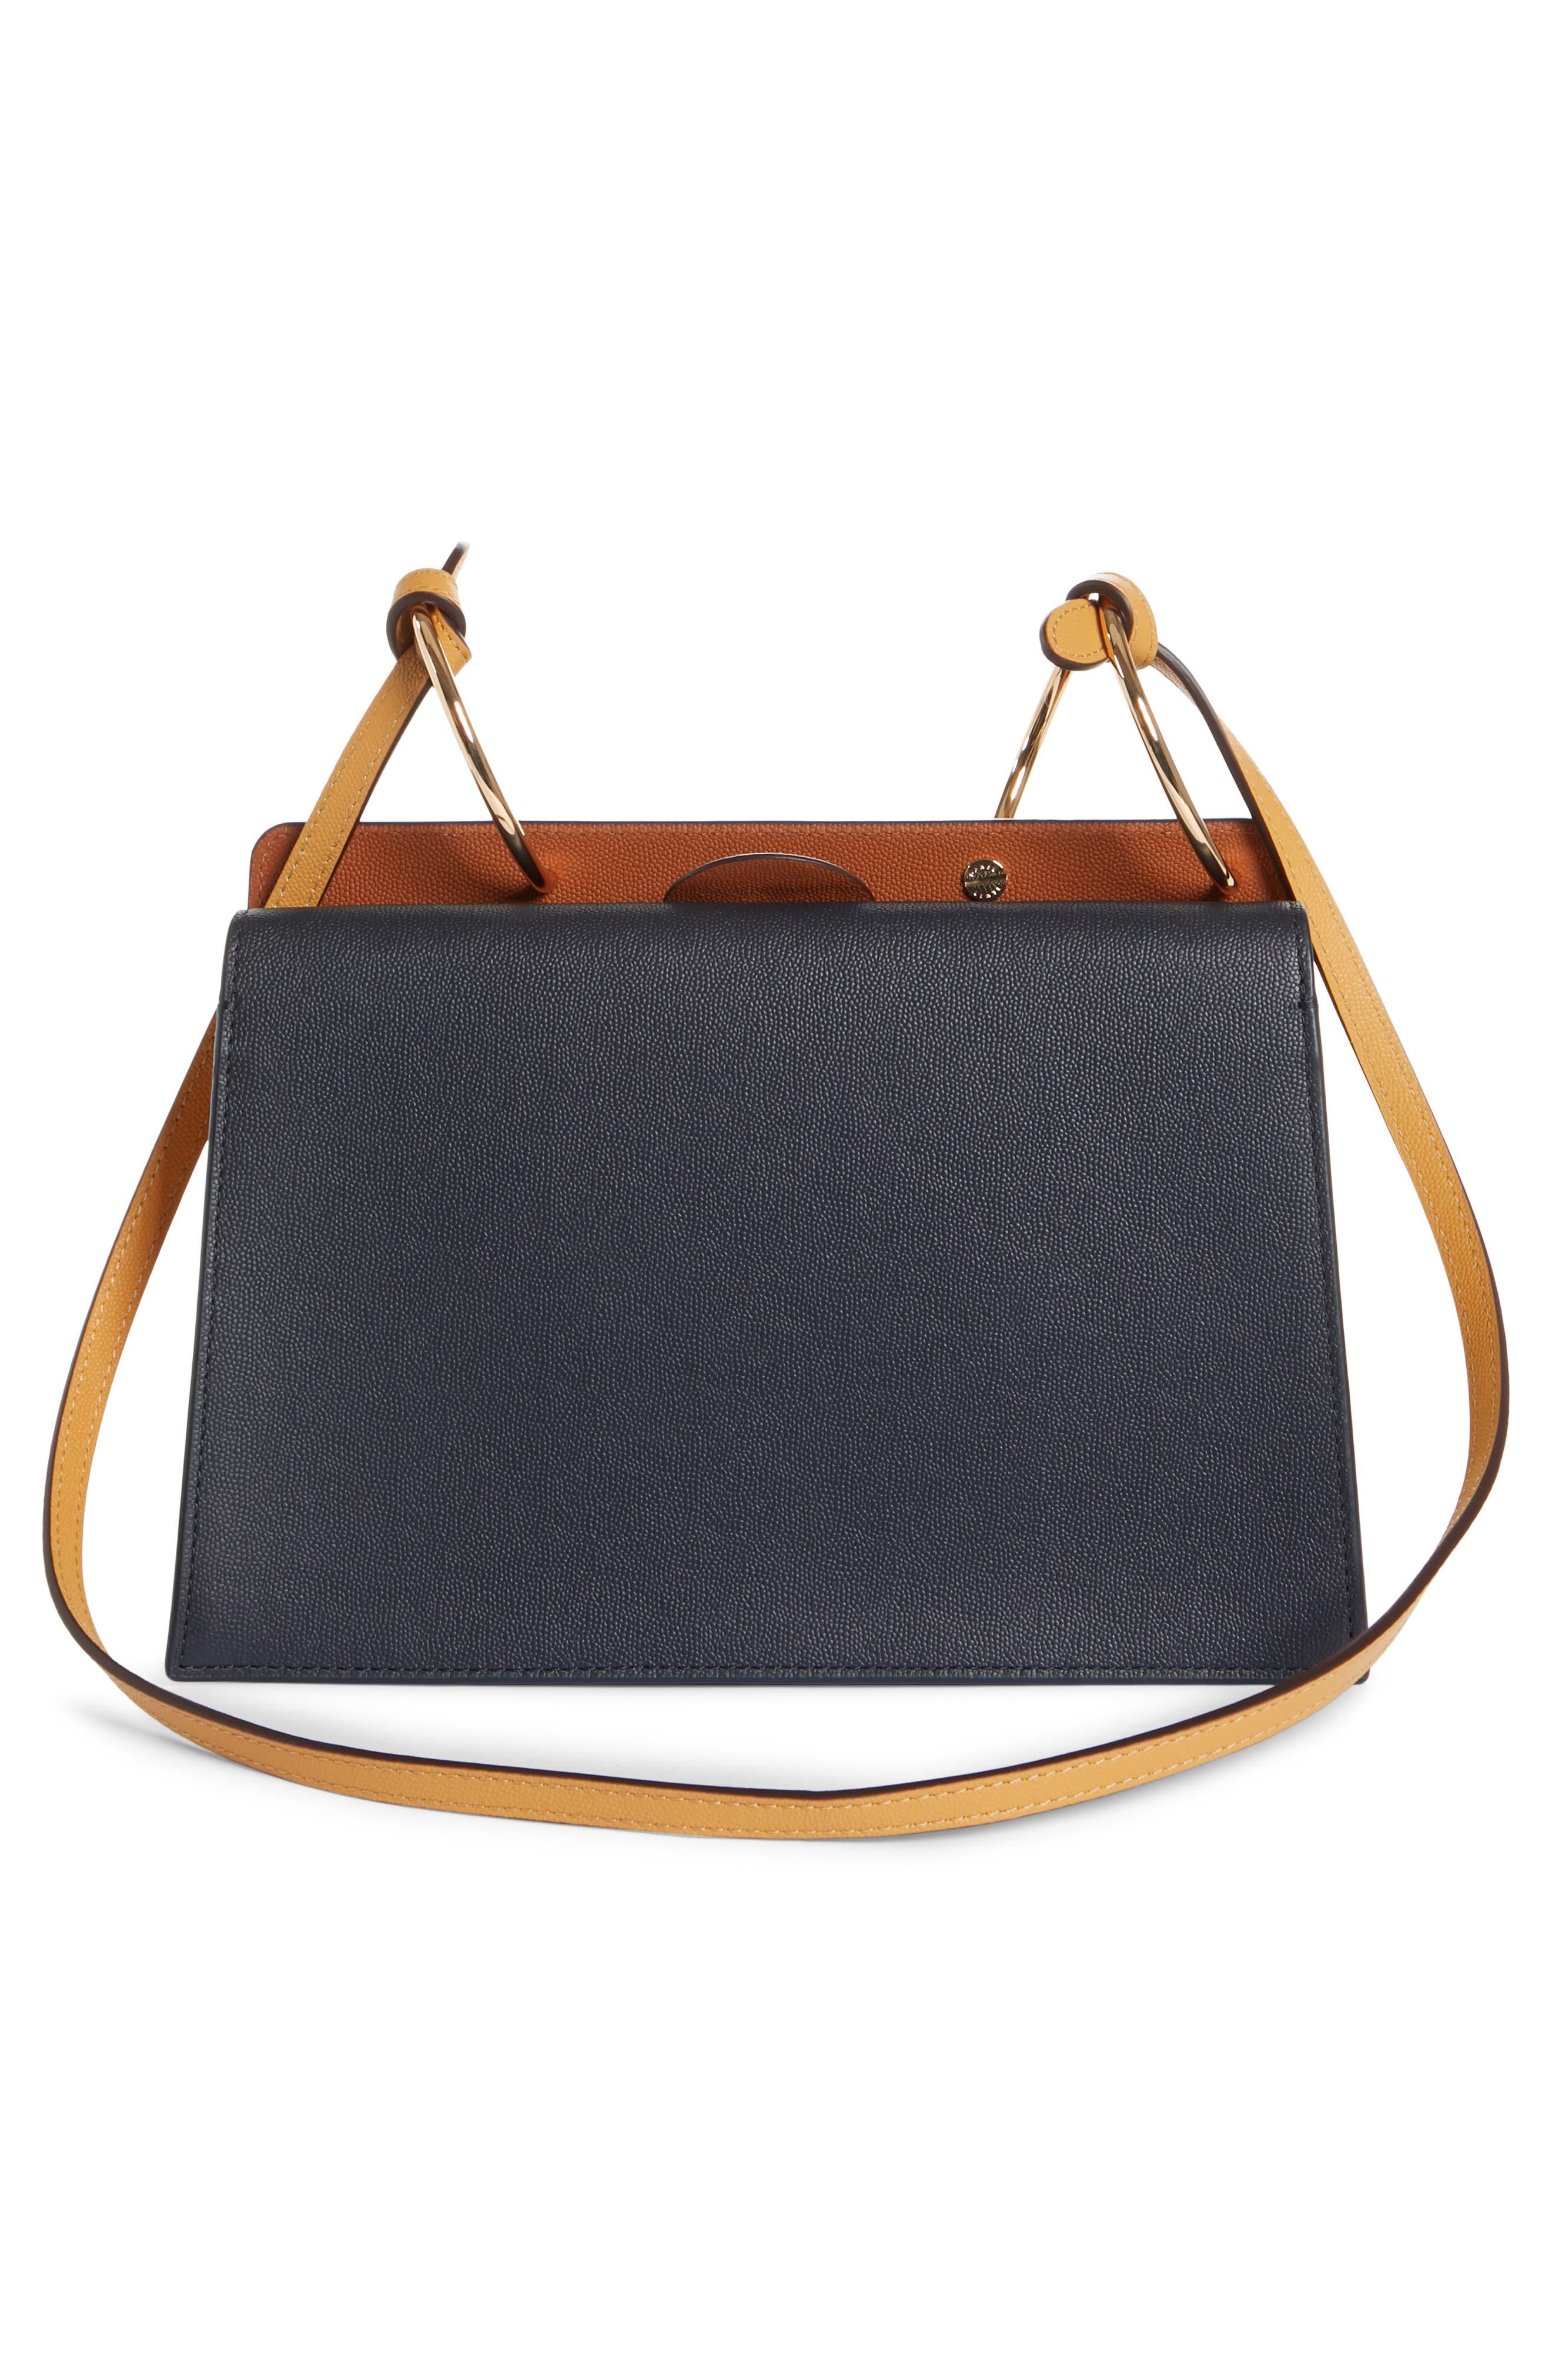 Phoebe Leather Crossbody Bag,                             Alternate thumbnail 3, color,                             MARINE/ SAND